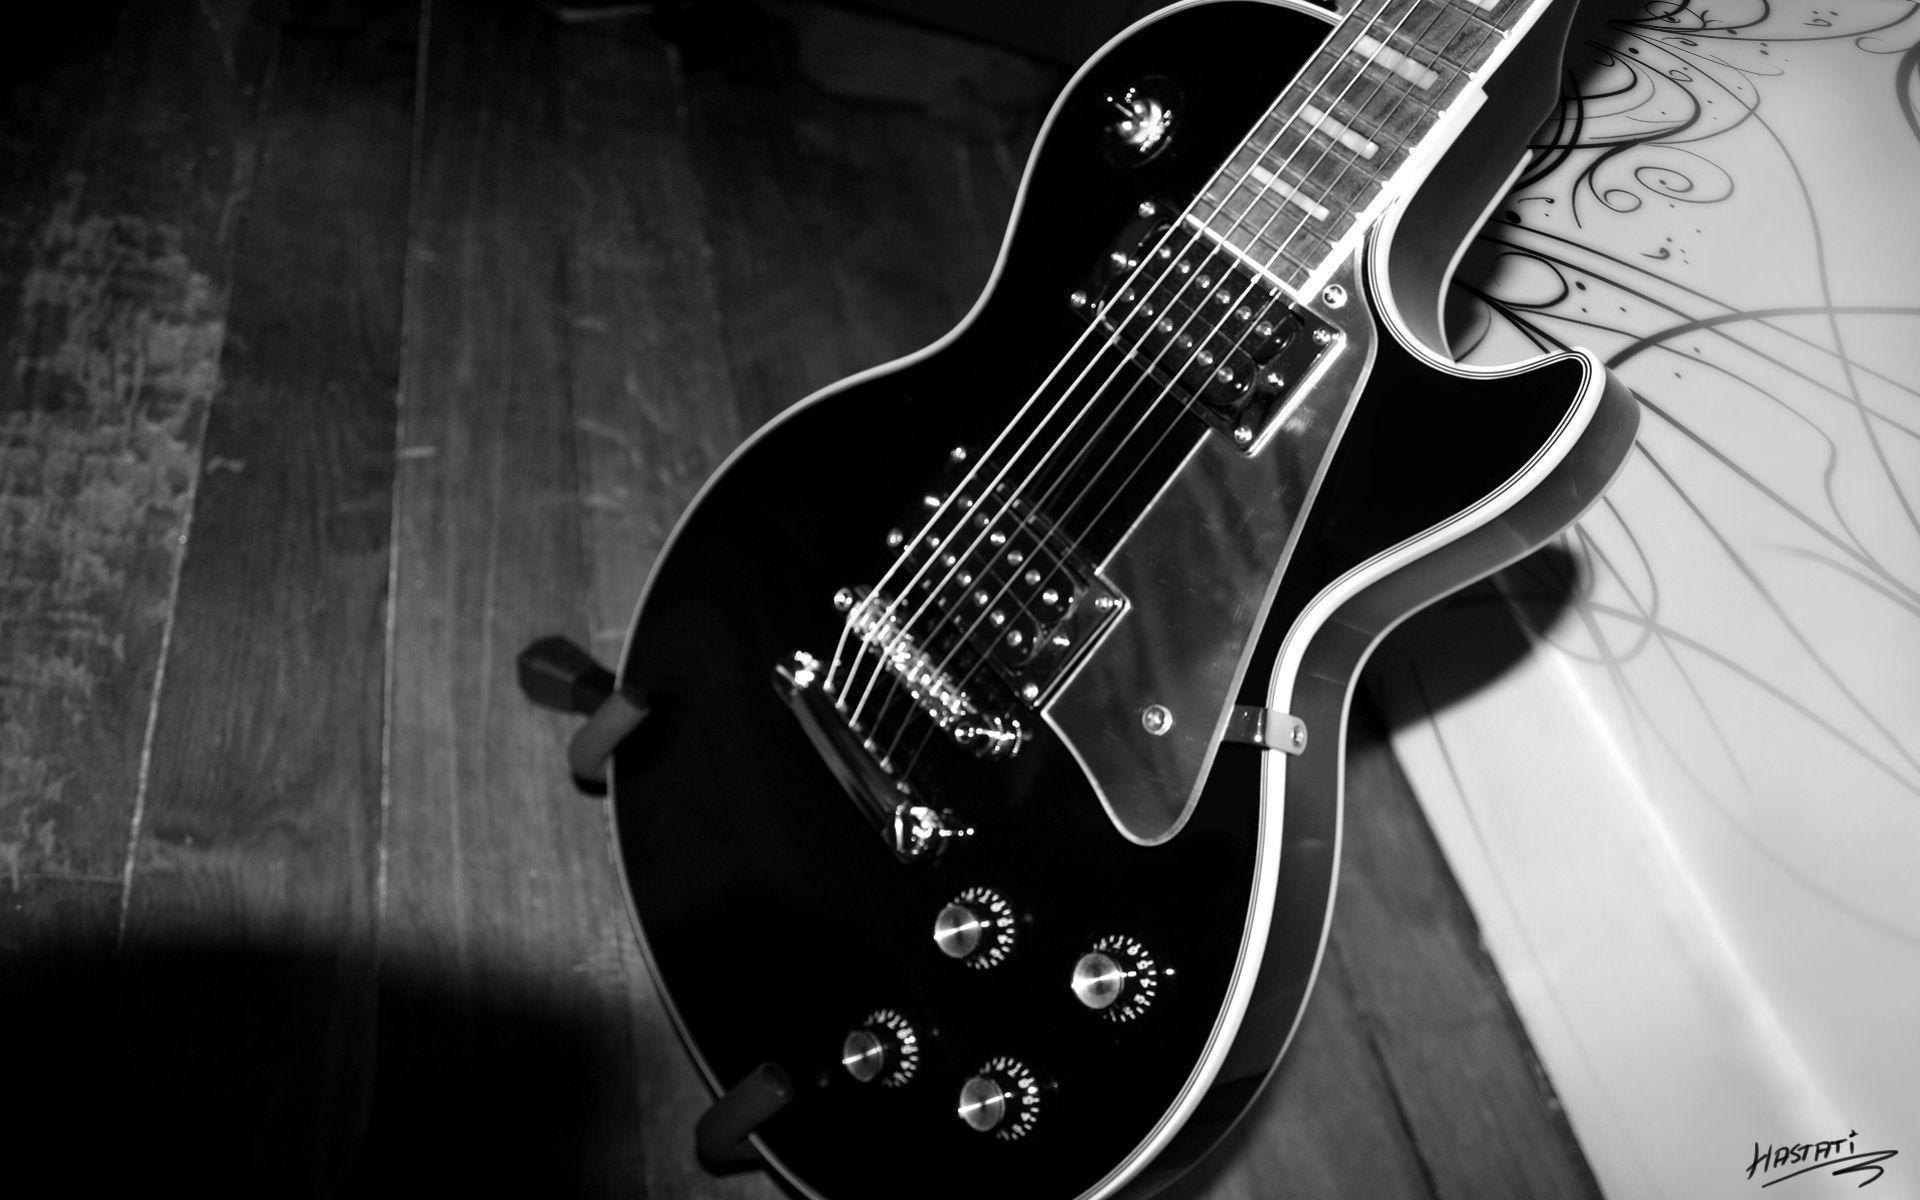 guitar wallpaper by artush - photo #20